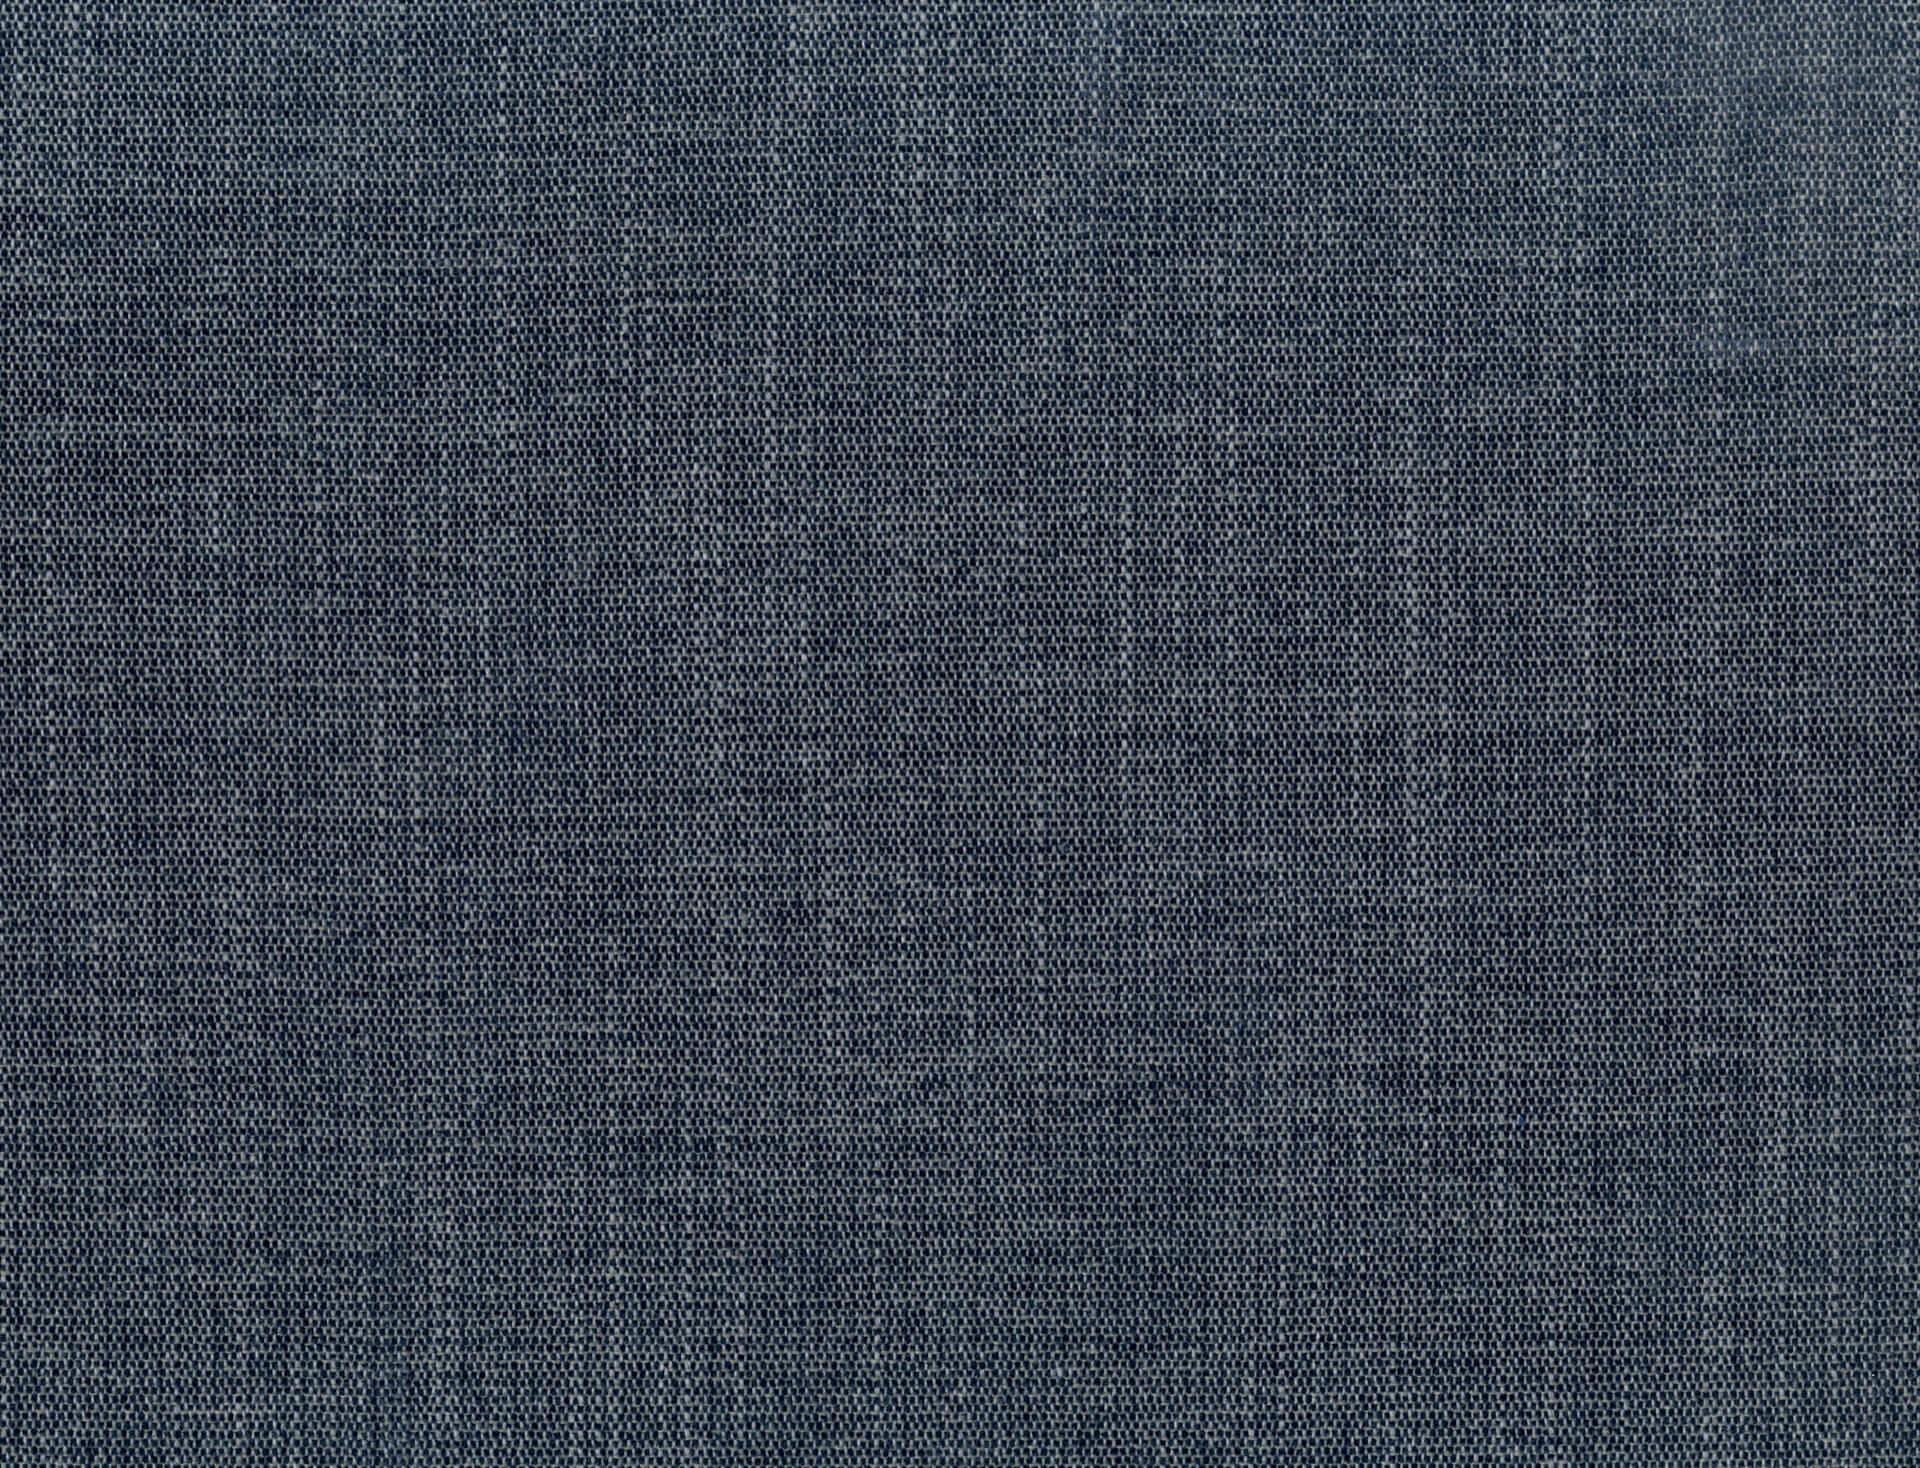 Nori Fabric Ocean Blue